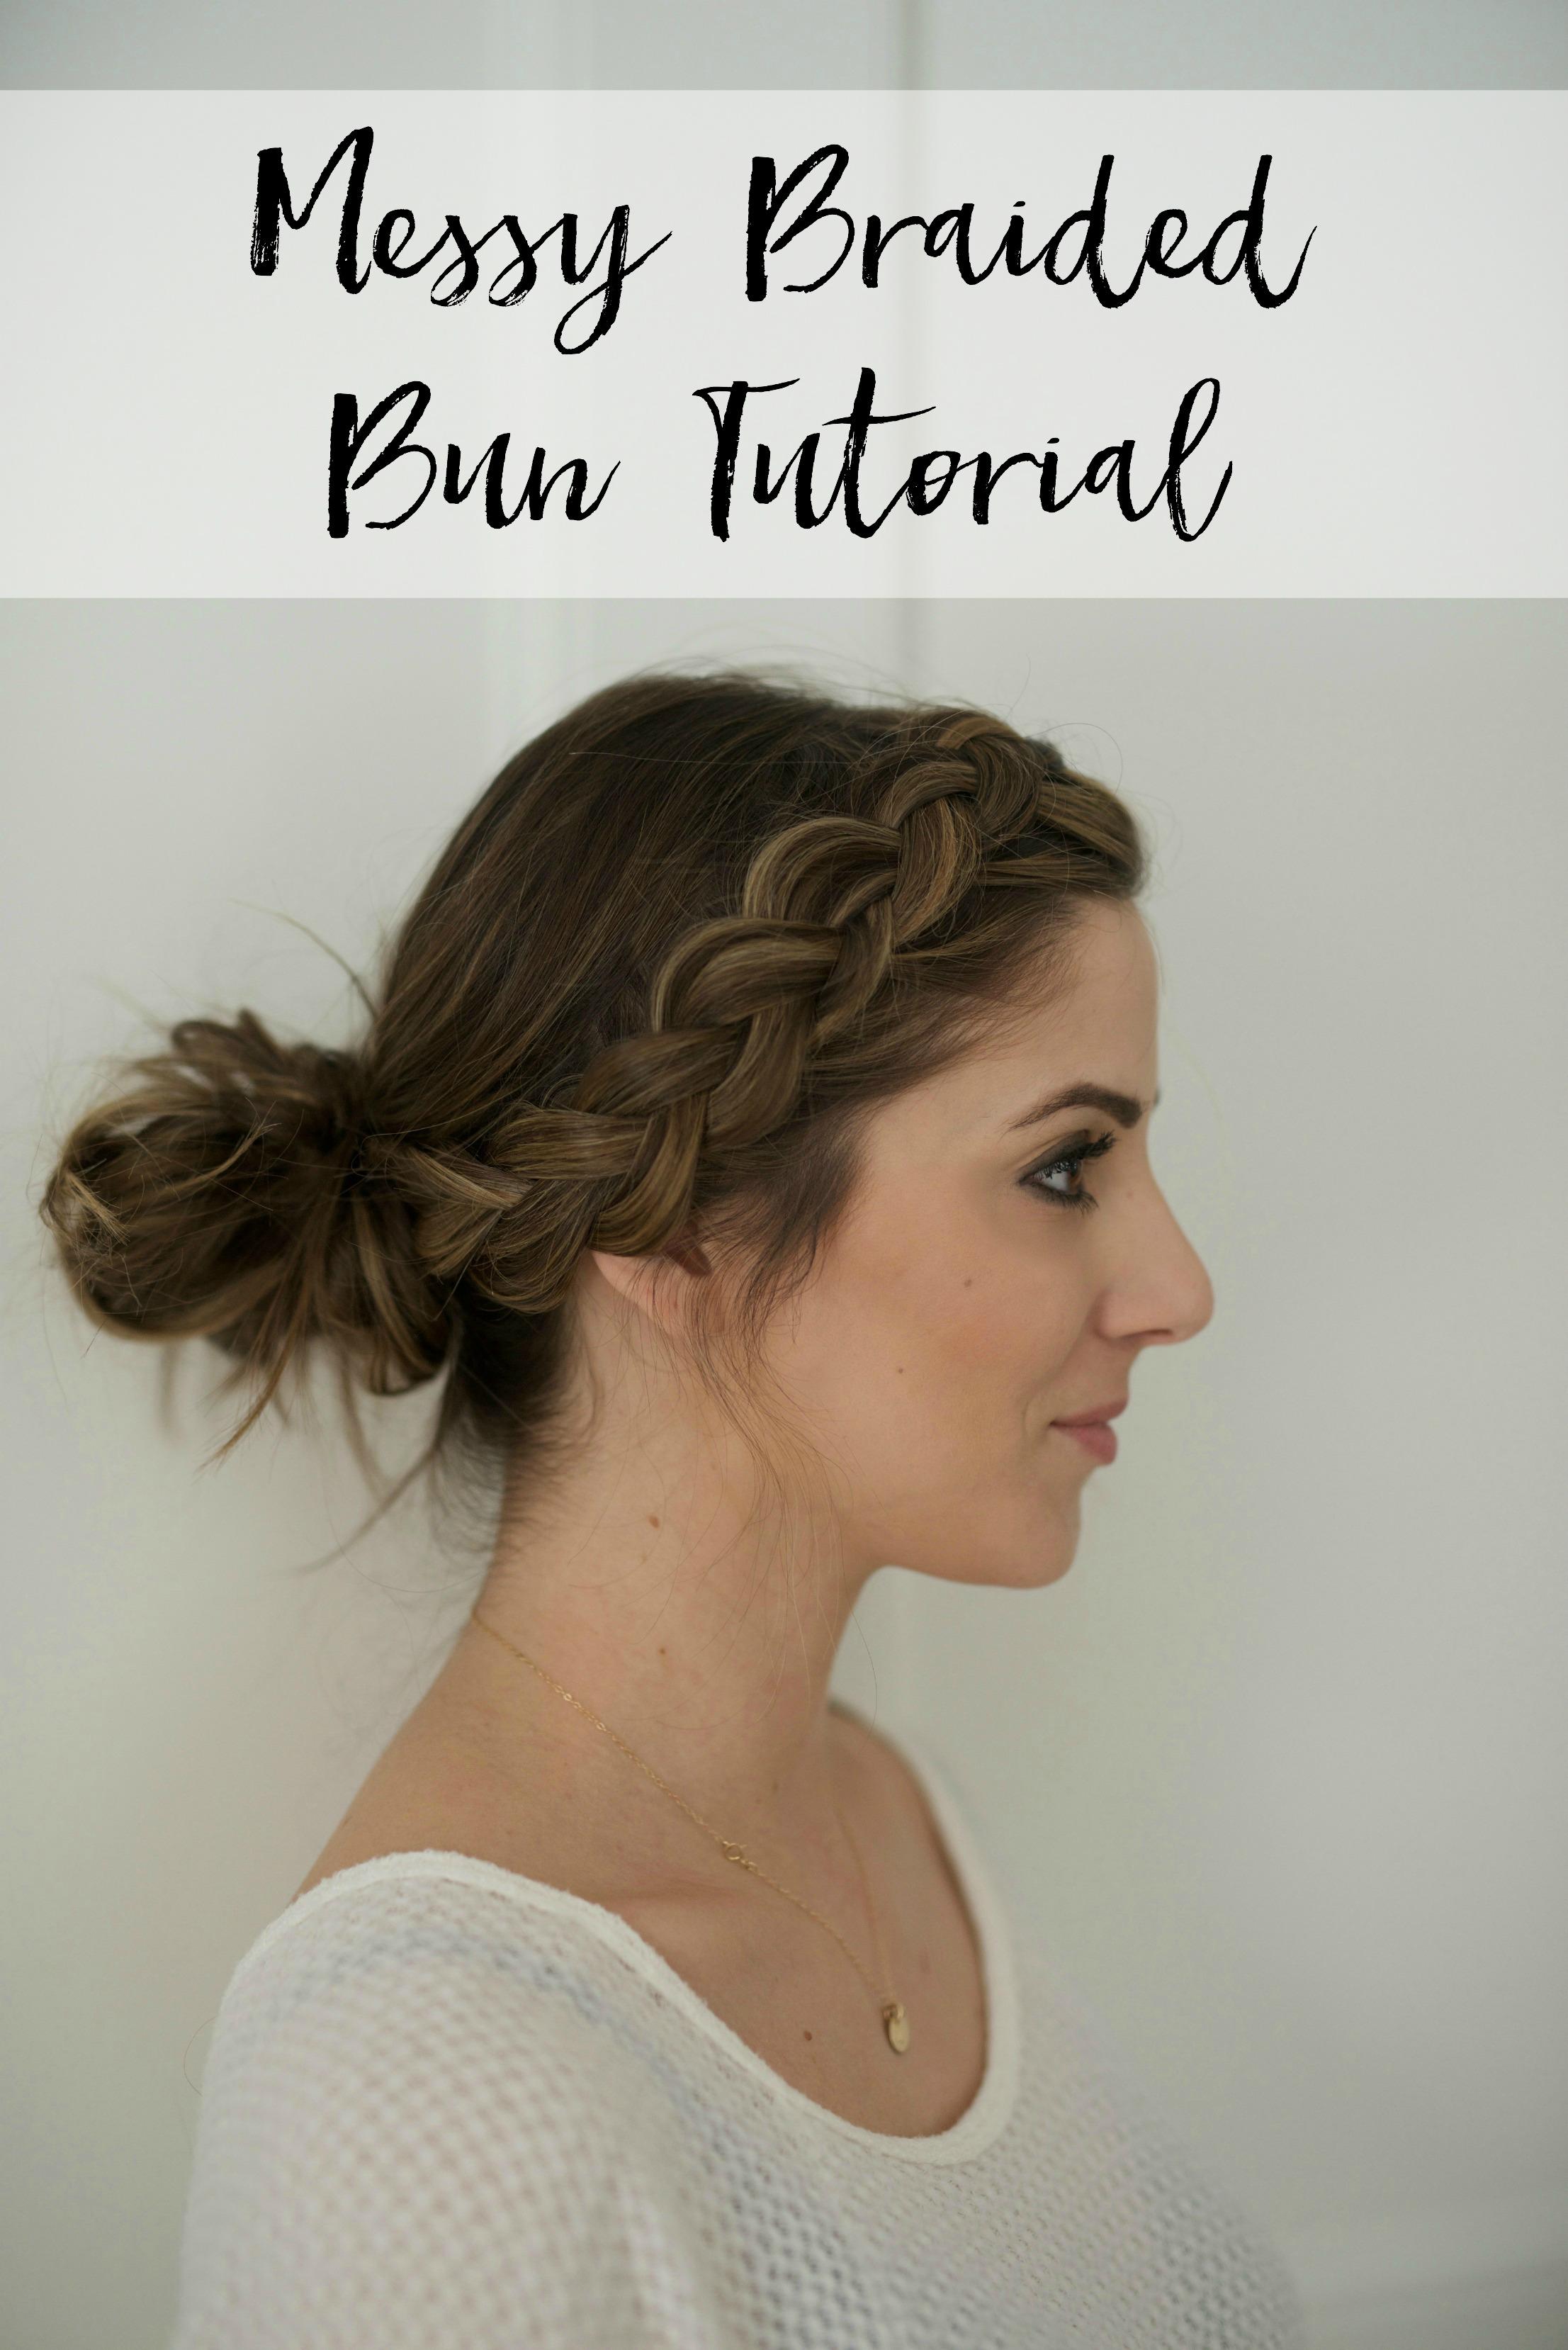 beauty messy braided bun tutorial lauren mcbride